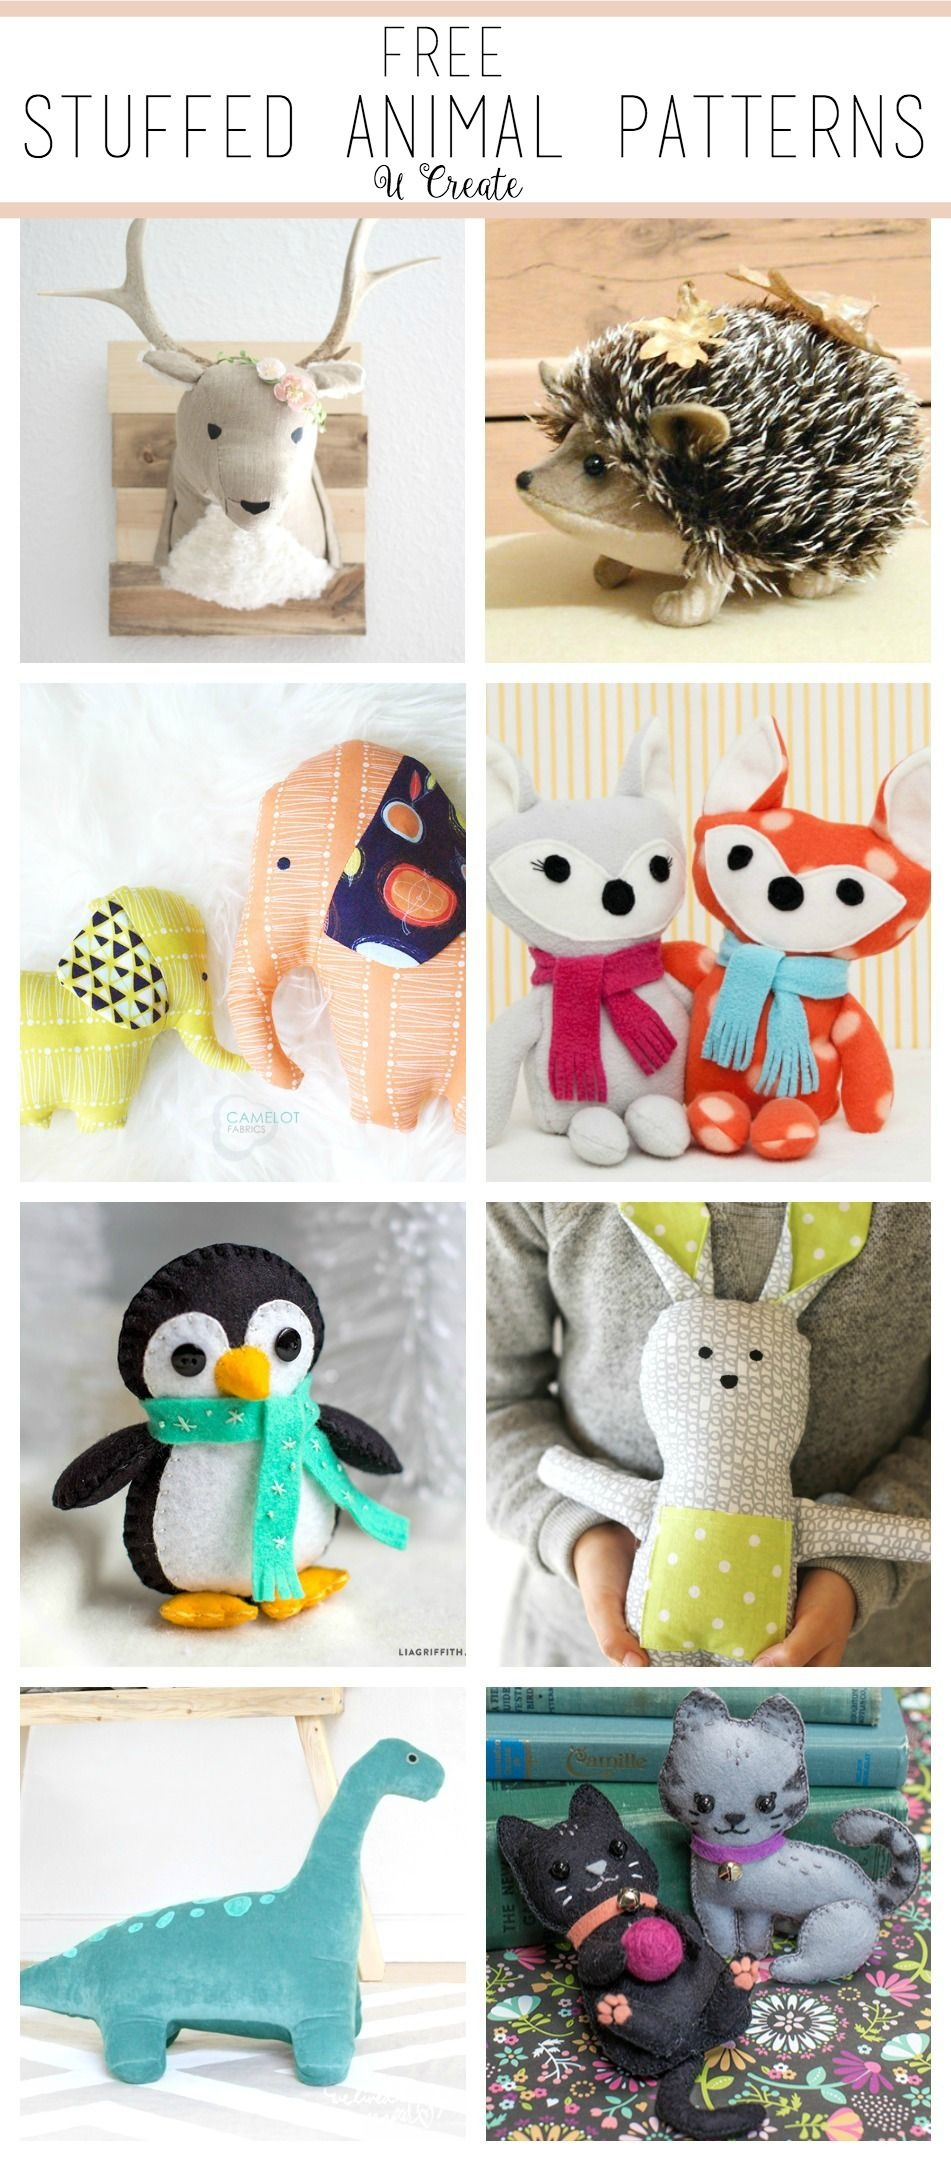 Free Stuffed Animal Patterns - The Cutest | Amigurumi | Sewing - Free Printable Stuffed Animal Patterns